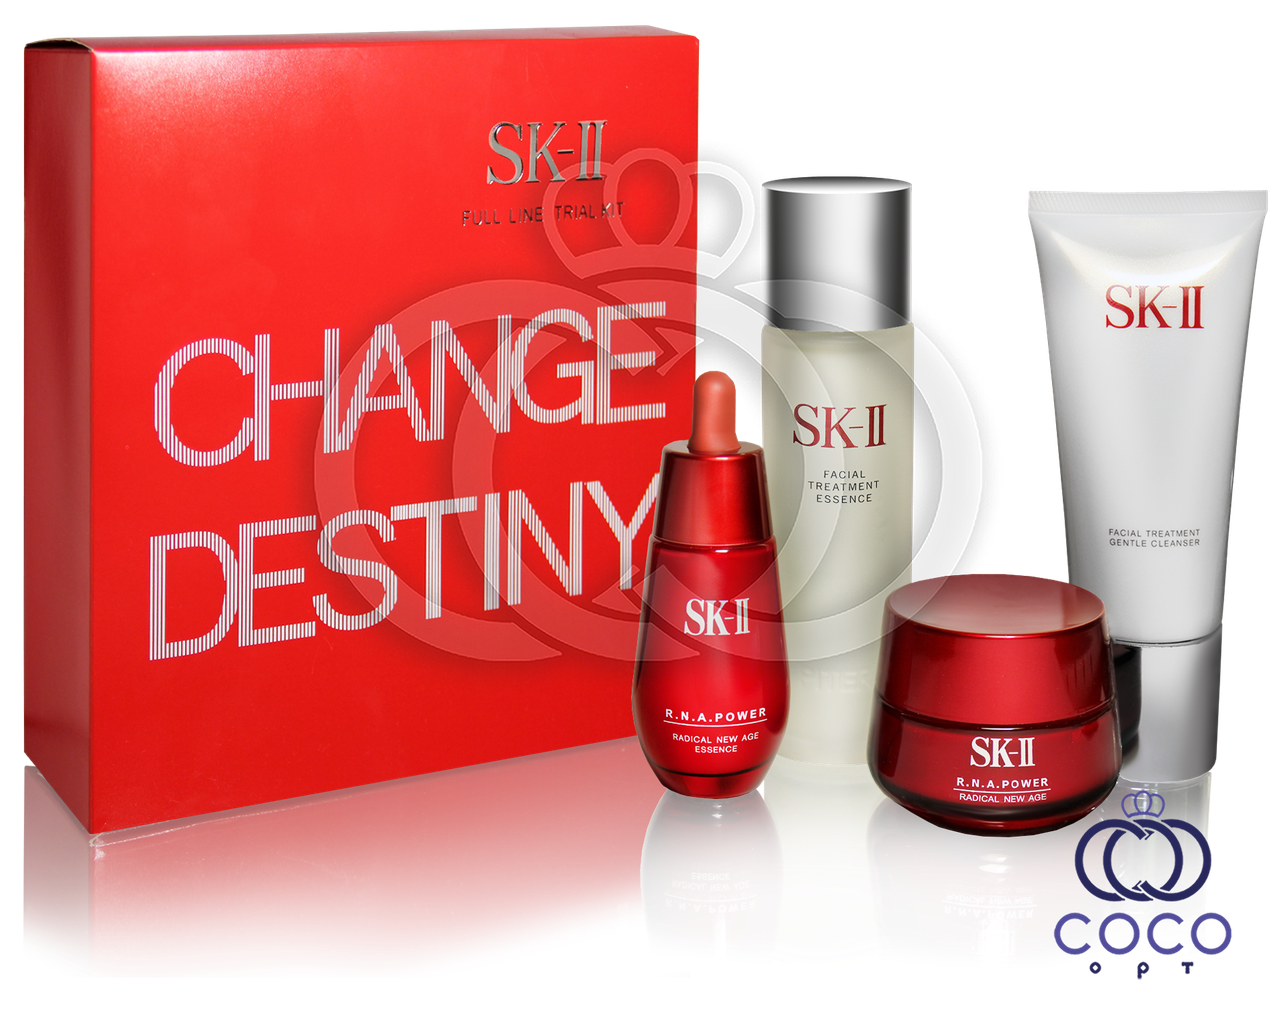 Подарочный набор для ухода за кожей SK-II Full Line Trial Kit